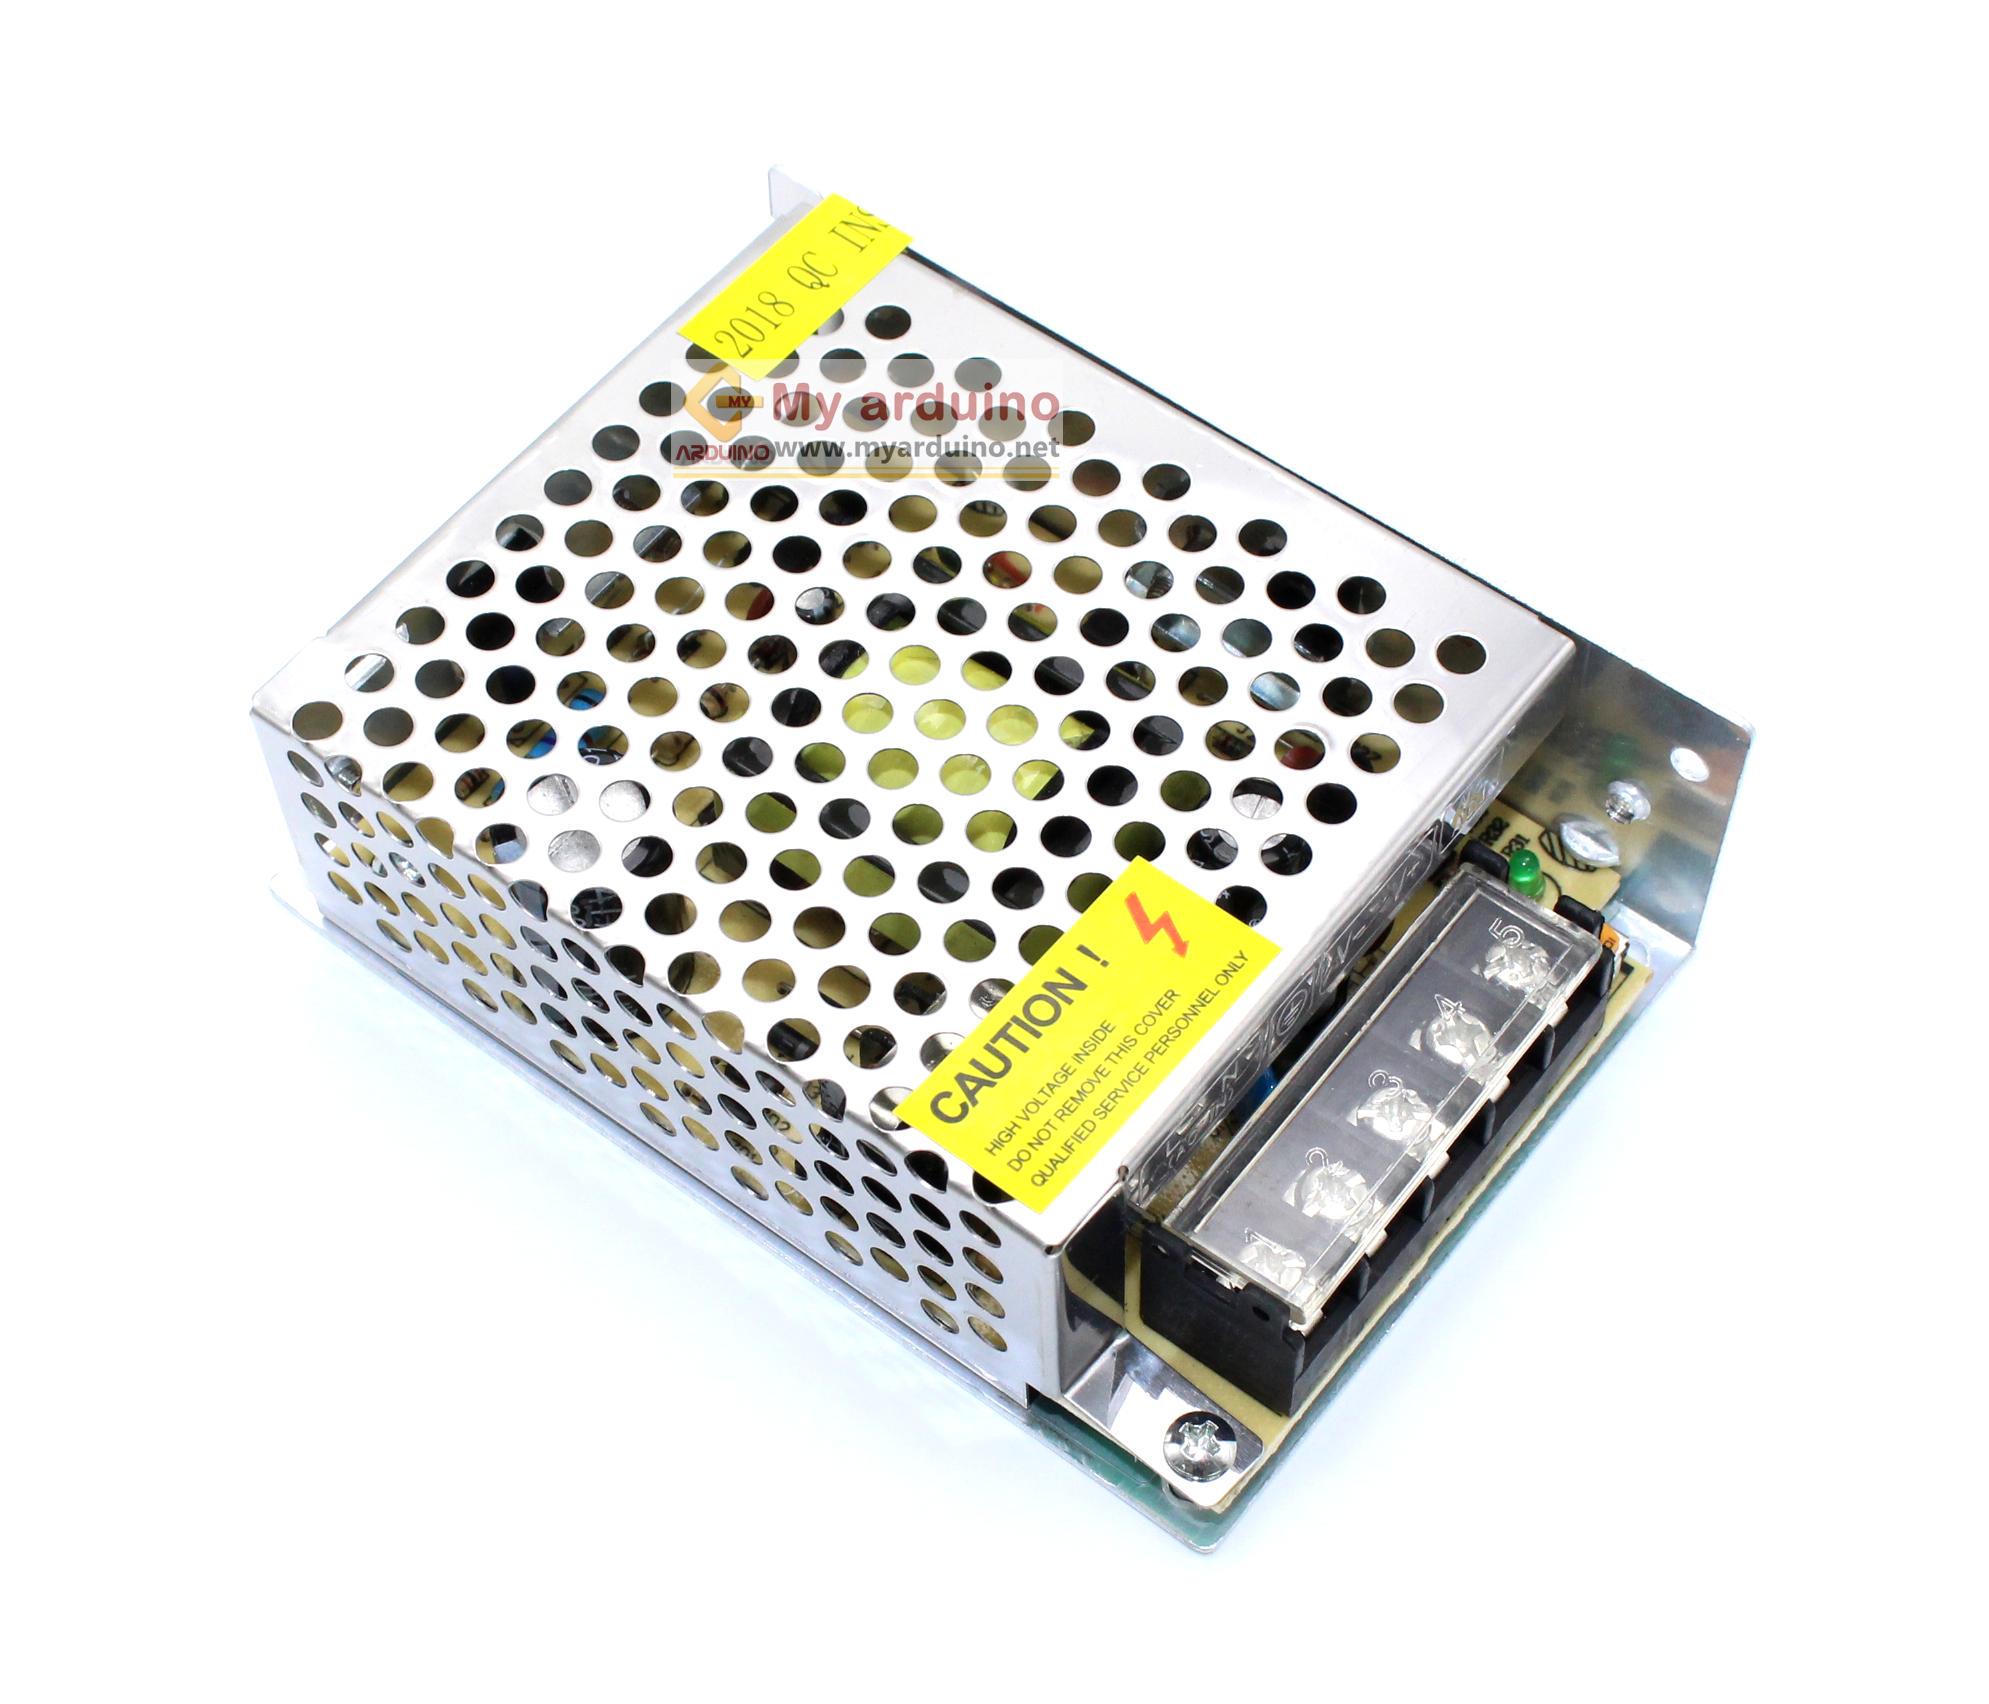 Switching Power supply แหล่งจ่ายไฟ 12V 5A